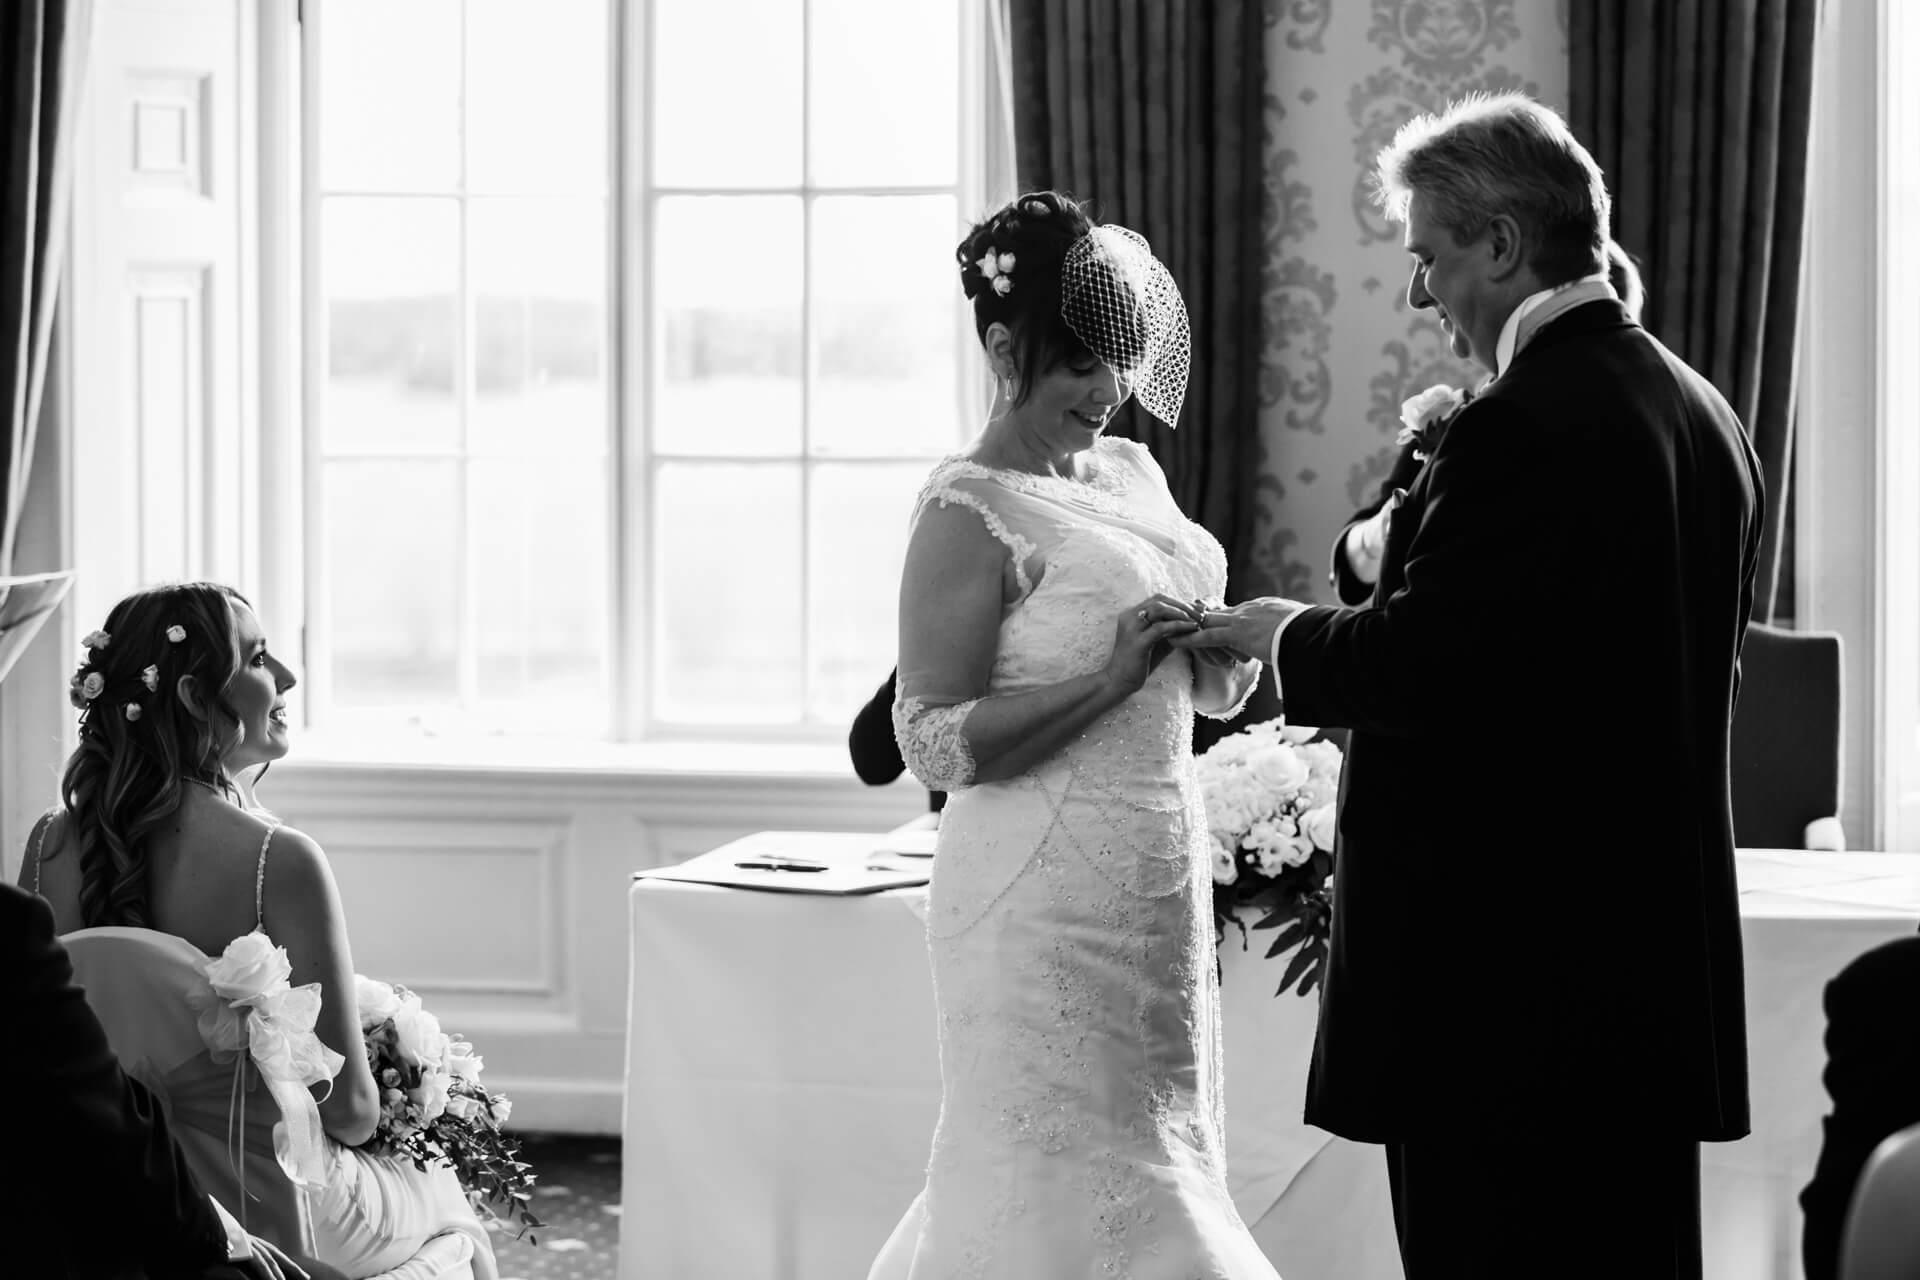 Hazlewood Castle wedding photographer - wedding couple say their vows